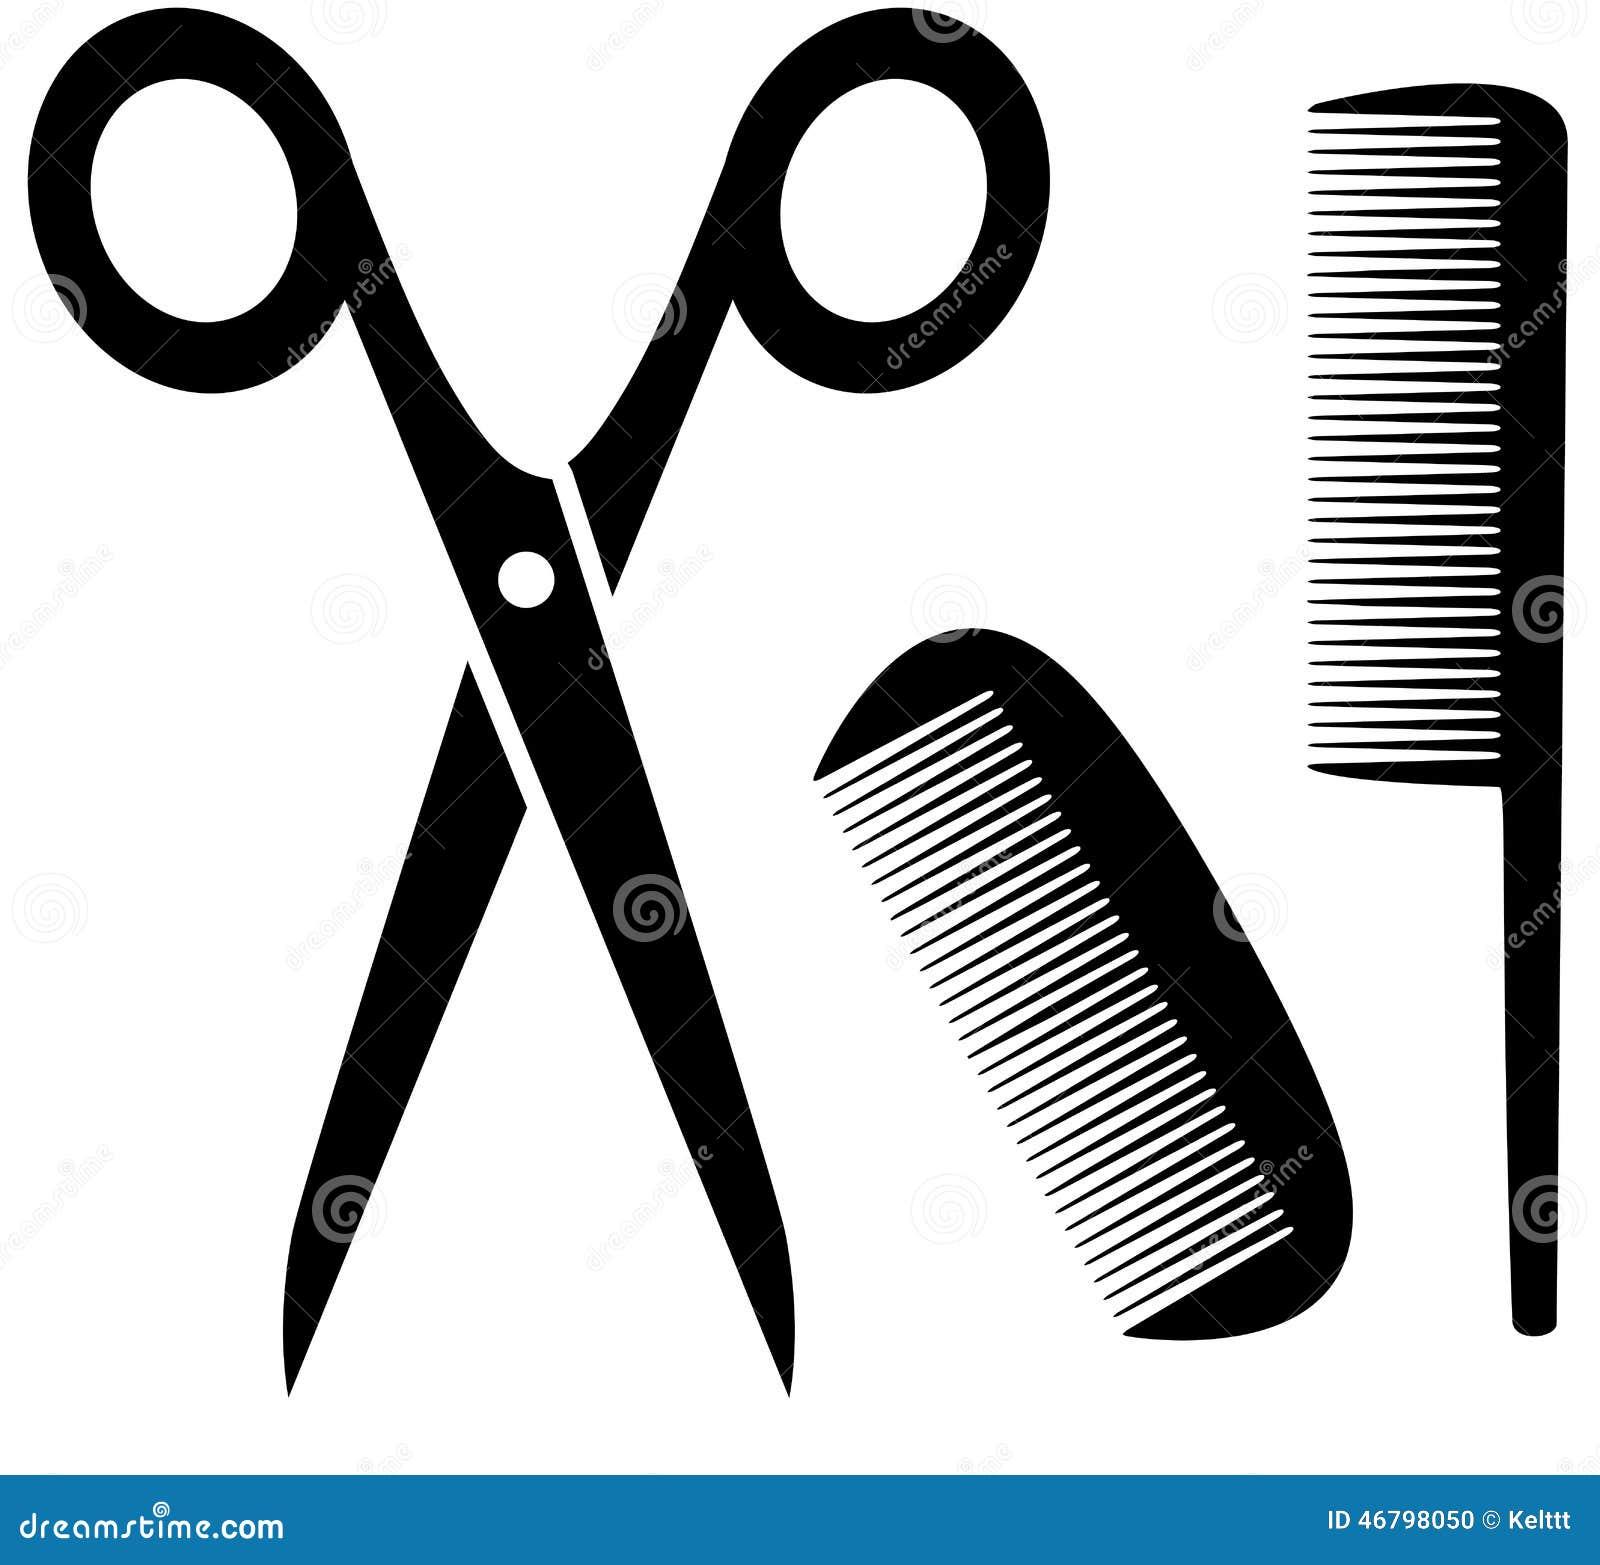 Public hair salon in bangalore dating 4